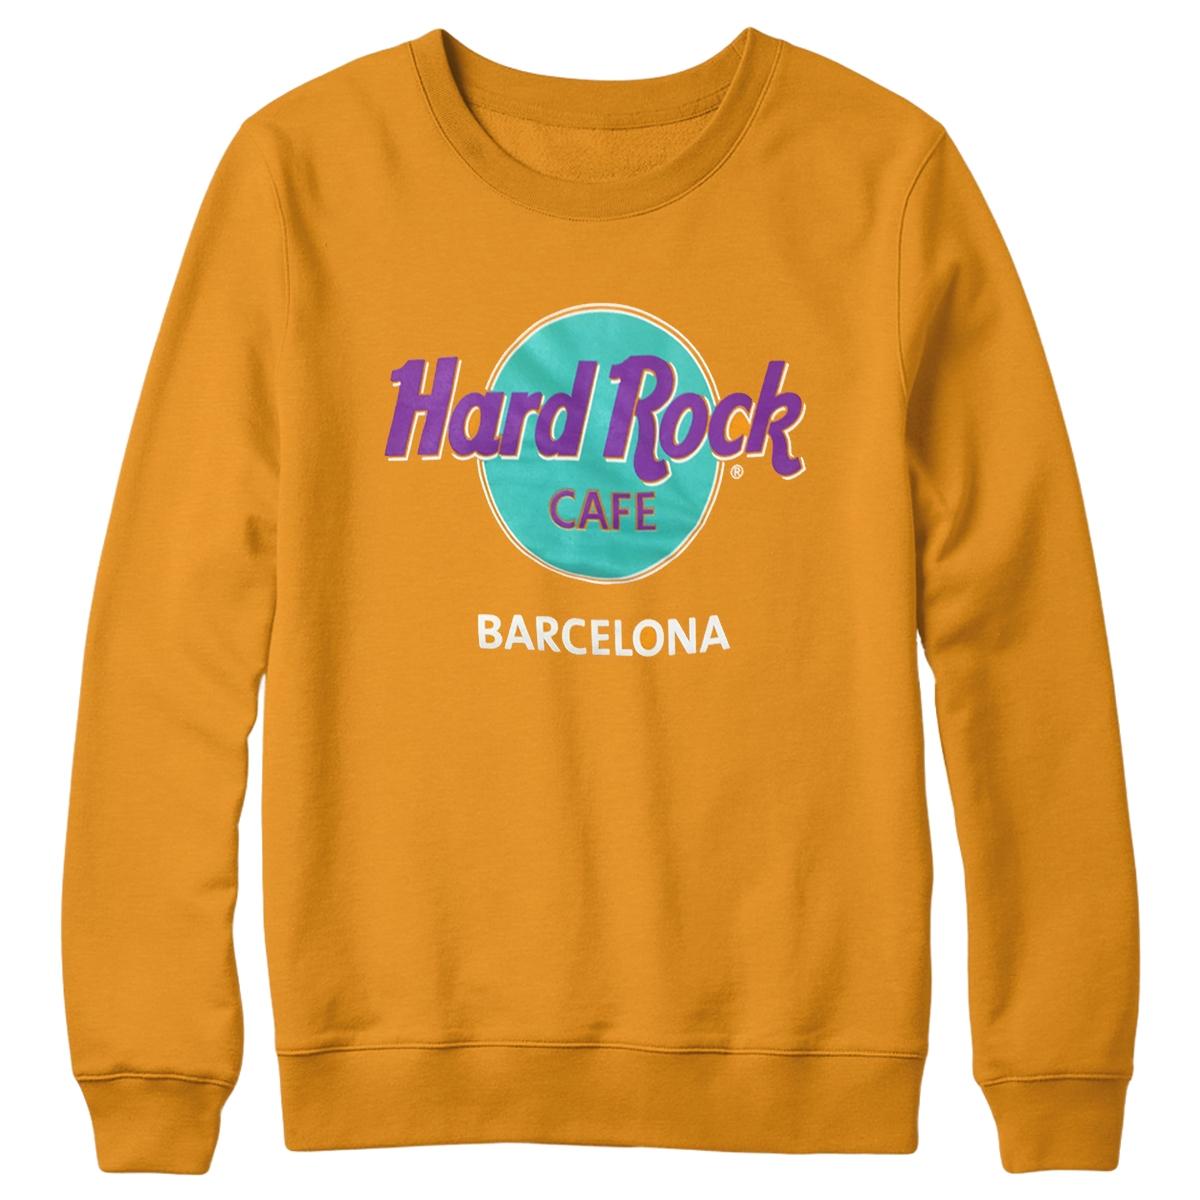 Hard Rock Cafe london sweatshirt crew neck jumper UylX852dJ